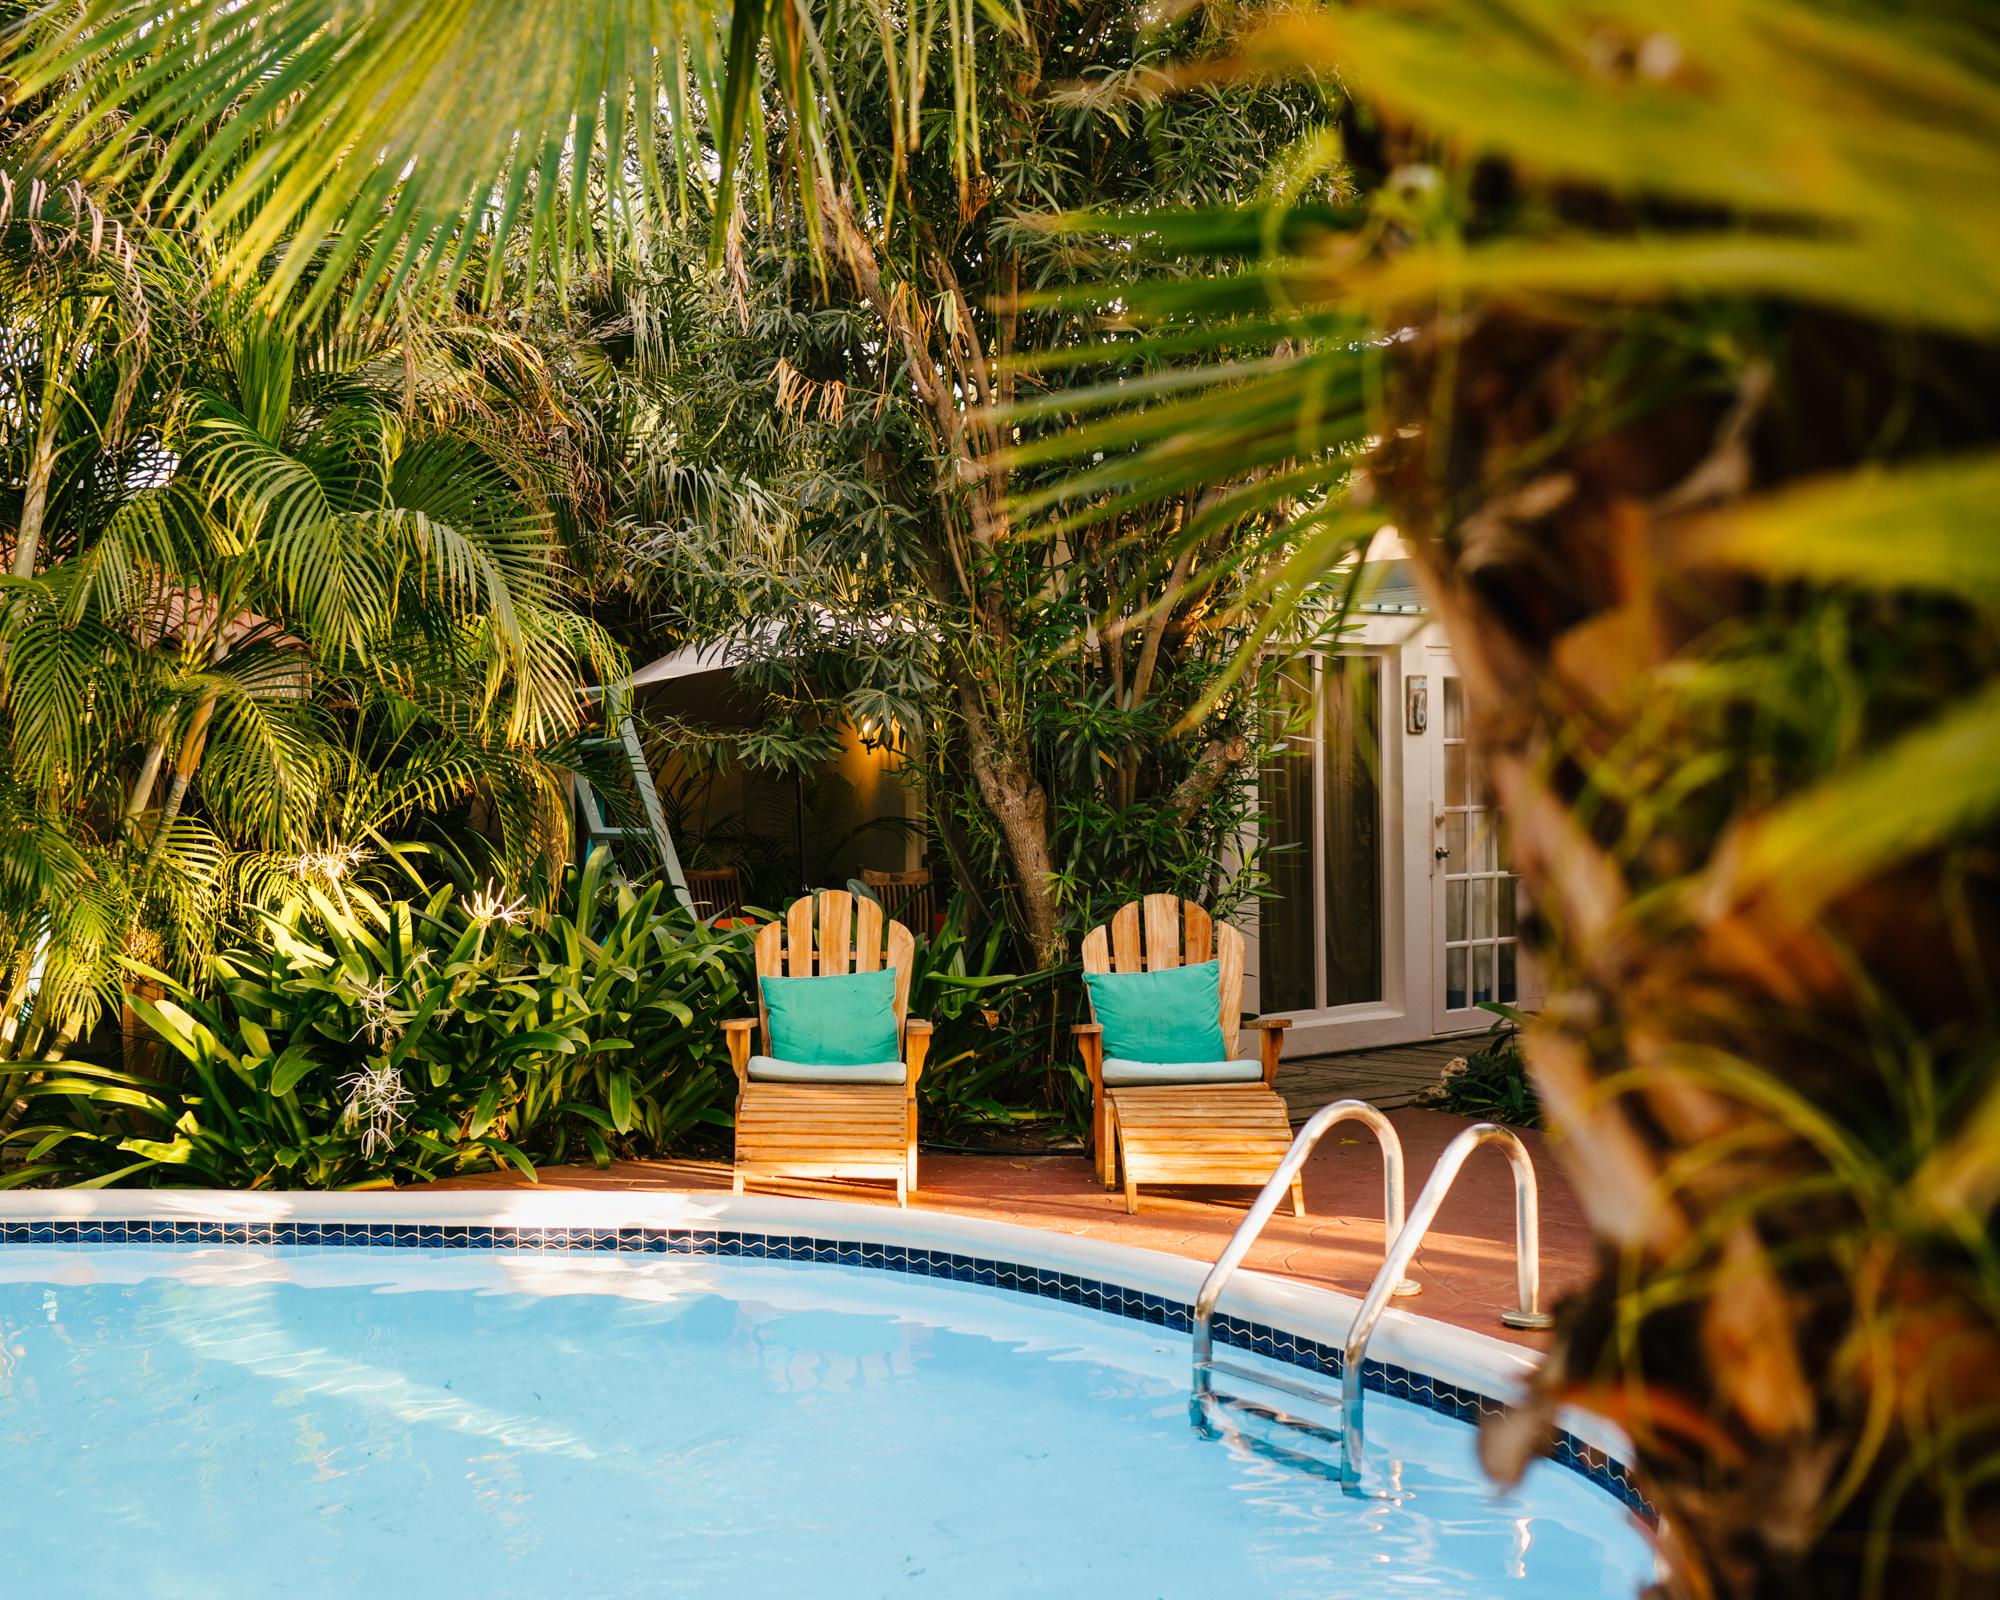 Aruba Travel Guide